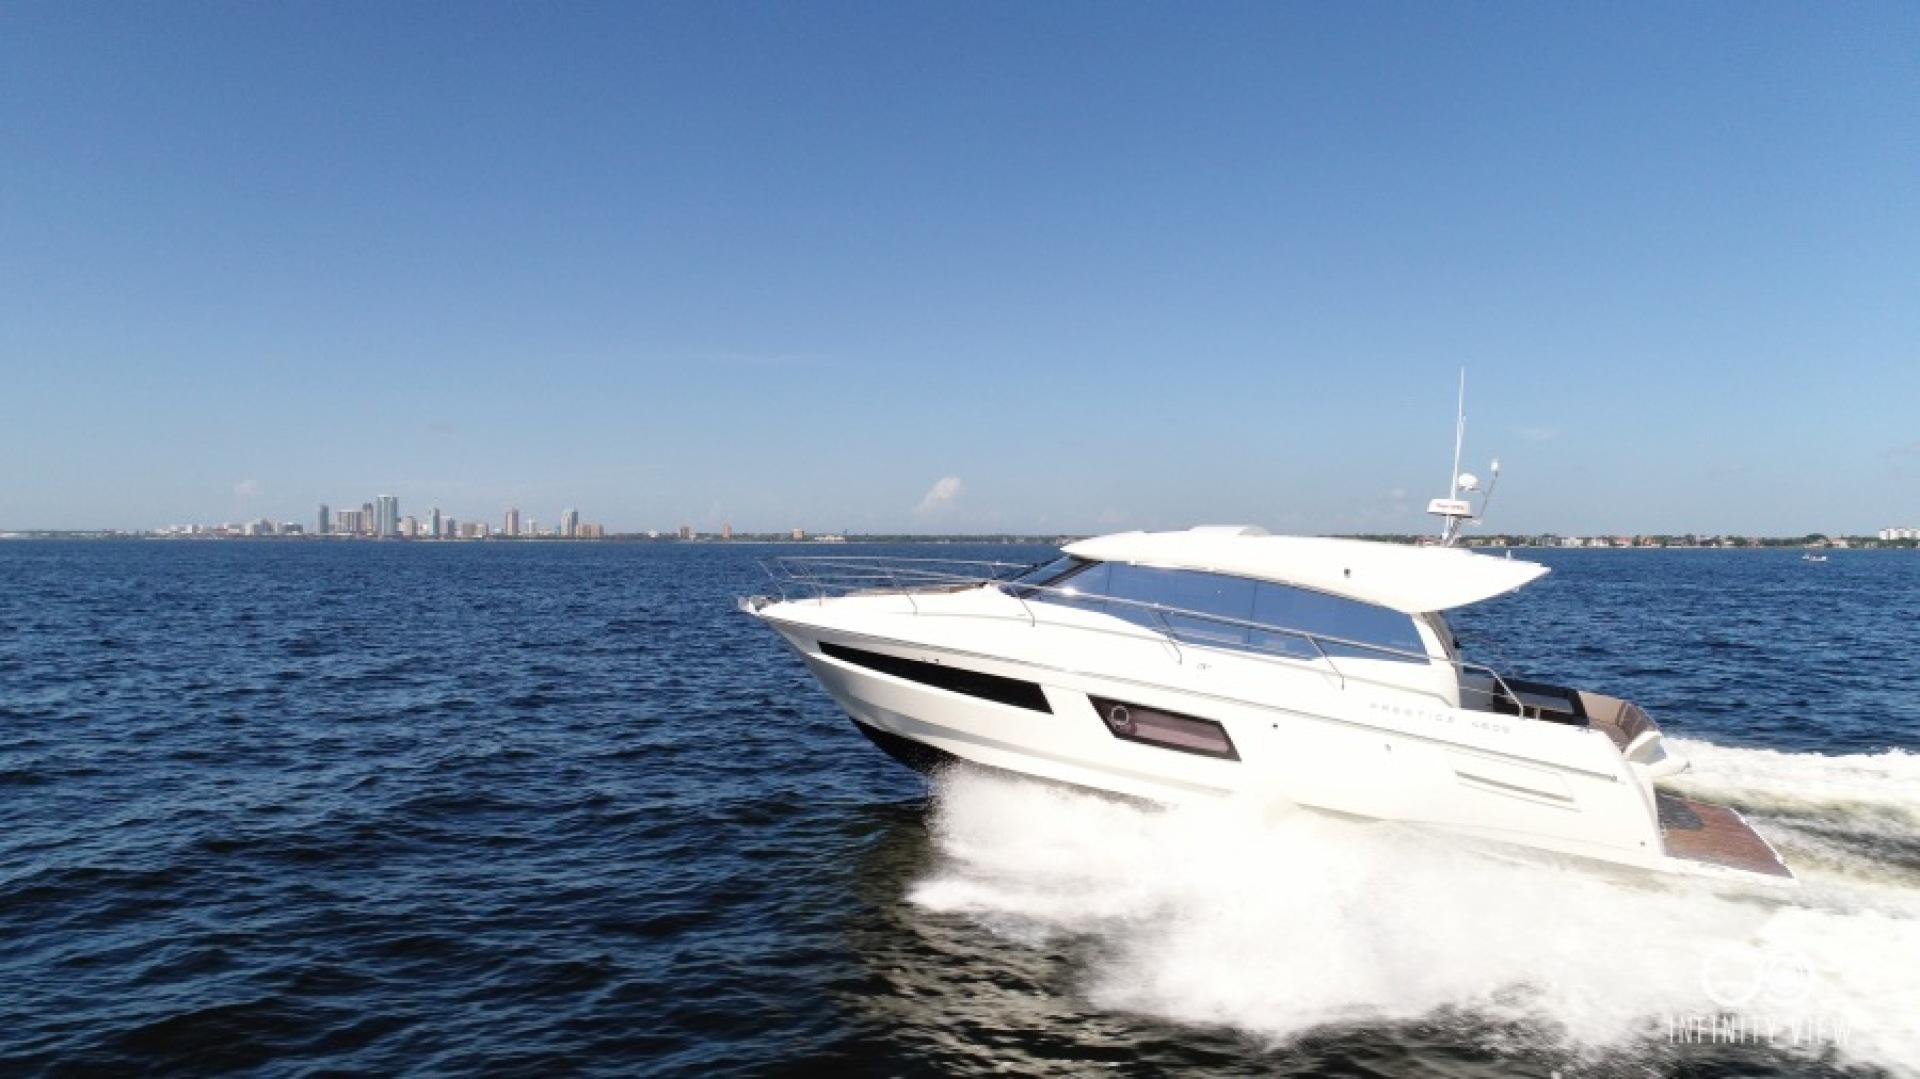 Prestige-460 S 2018-Unforgettable St Petersburg-Florida-United States-2018 Prestige 460 S Yacht  Unforgettable  Running Profile-1444304   Thumbnail